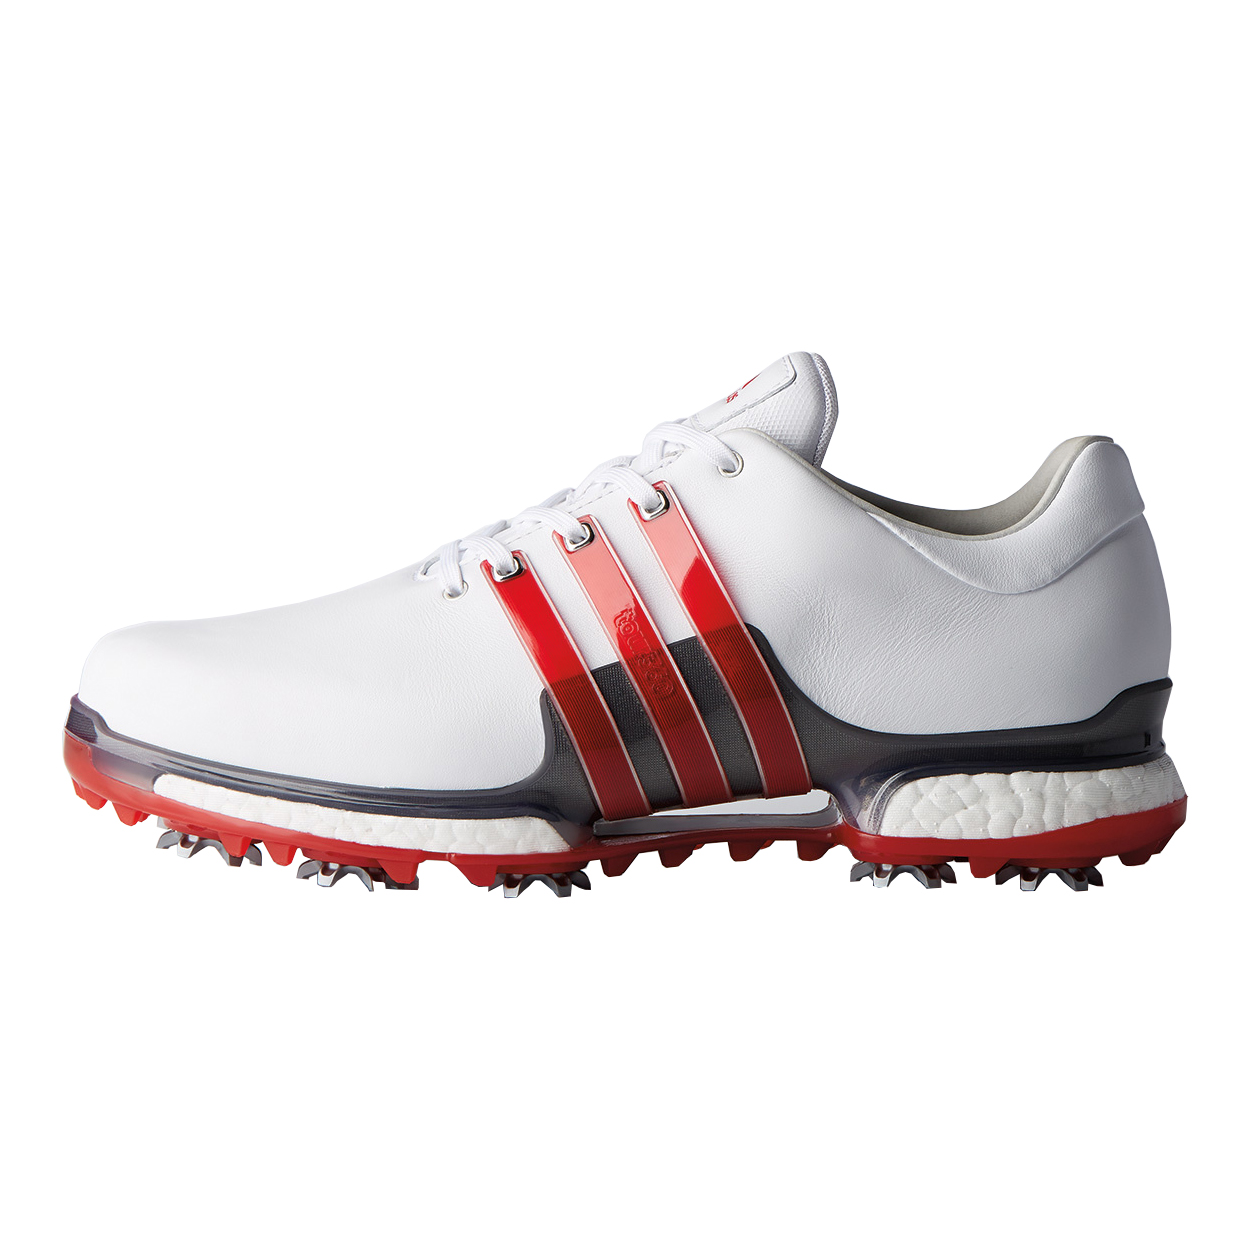 Adidas-Tour-360-2-0-Zapatos-De-Golf-De-Cuero-A-ESTRENAR miniatura 16